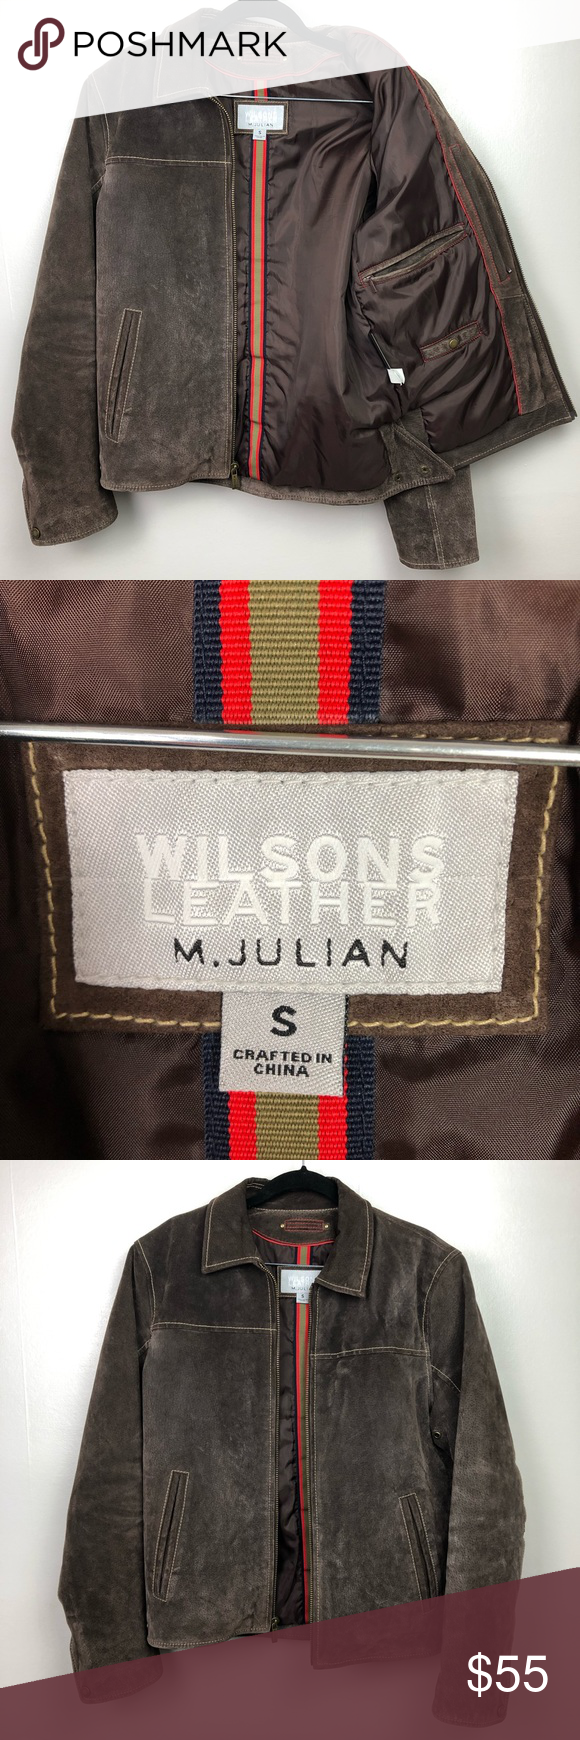 Wilson Genuine Leather Suede Jacket Sz S Suede jacket